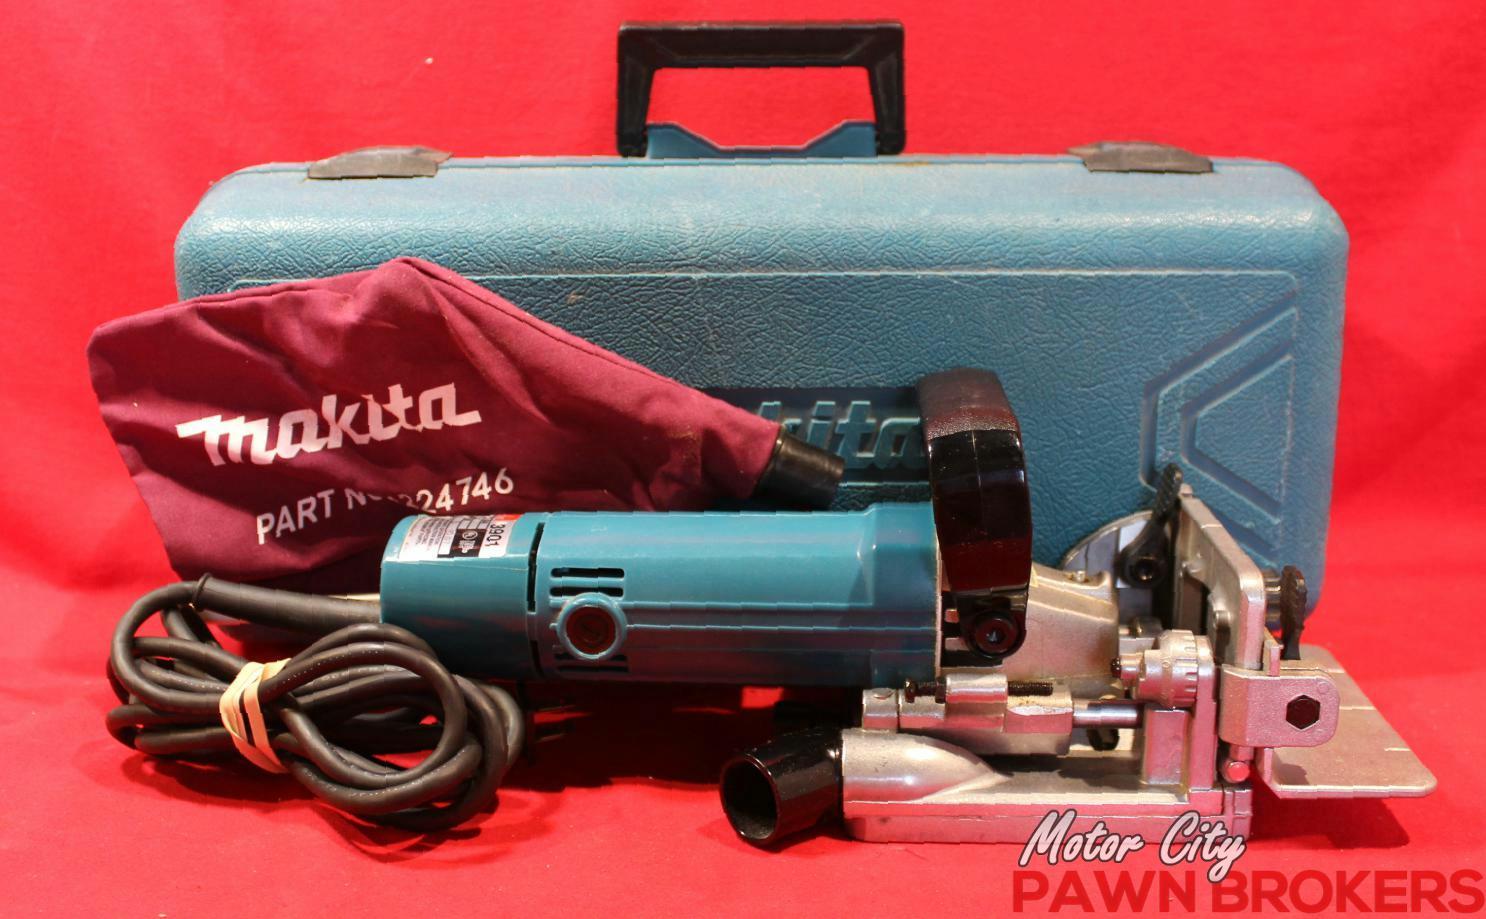 Makita 3901 5 6 amp 10 000 rpm six depth settings for Motor city pawn shop